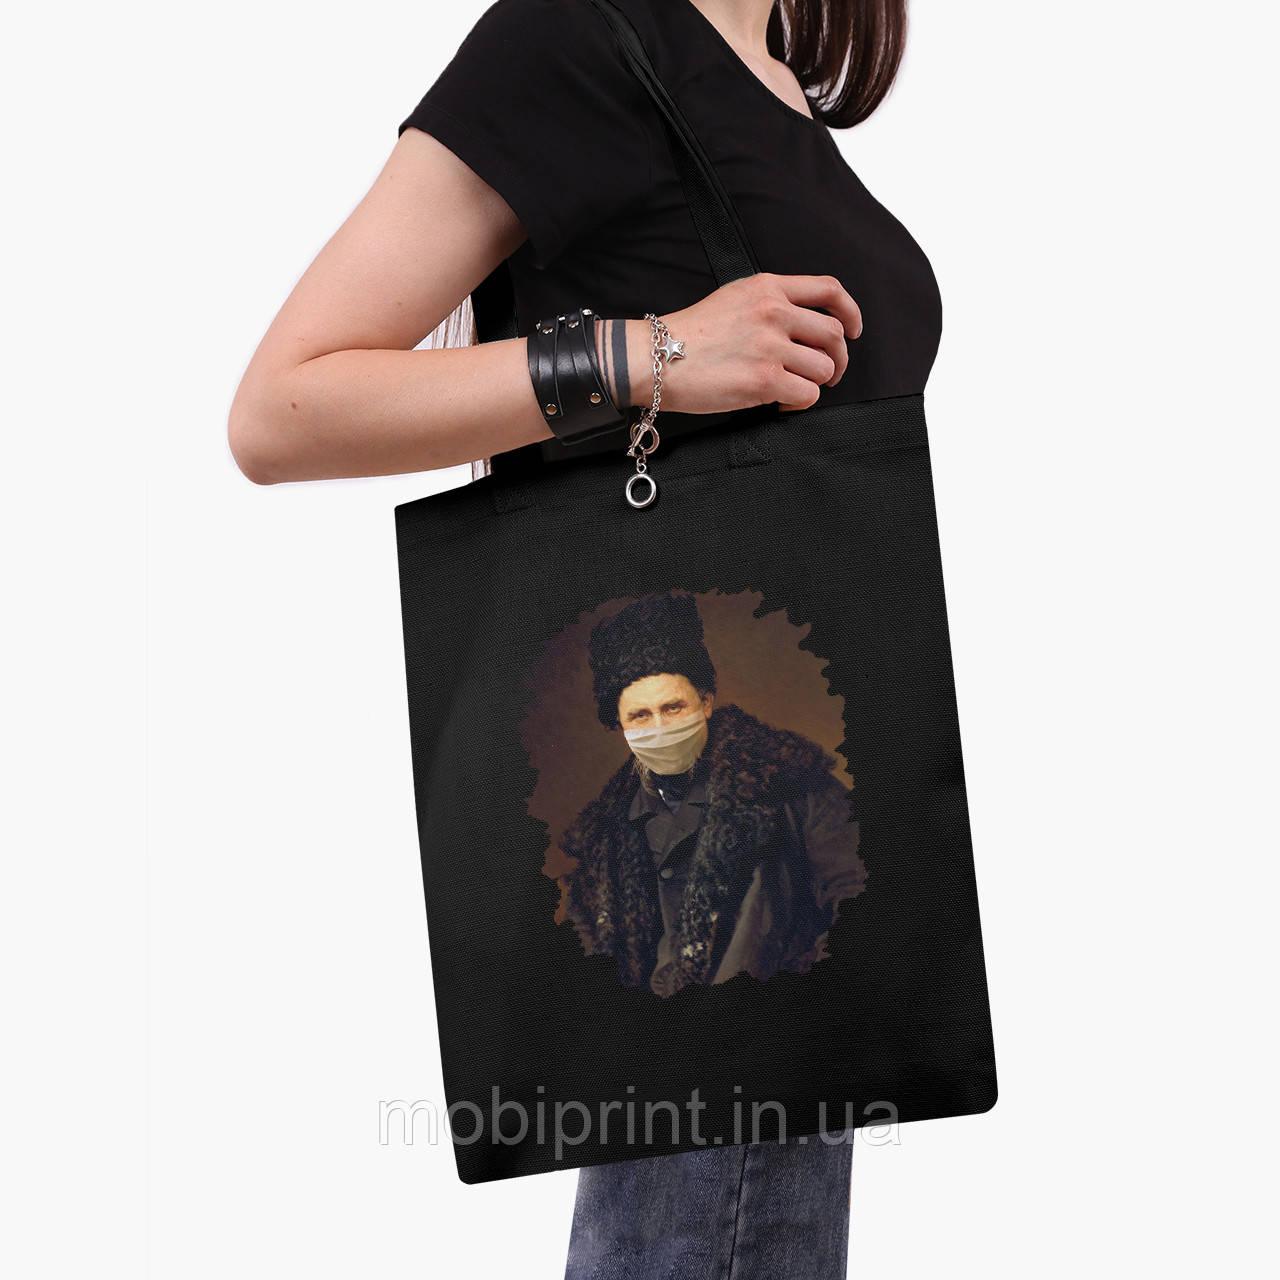 Эко сумка шоппер черная Тарас Шевченко (Taras Shevchenko) (9227-1427-2)  экосумка шопер 41*35 см